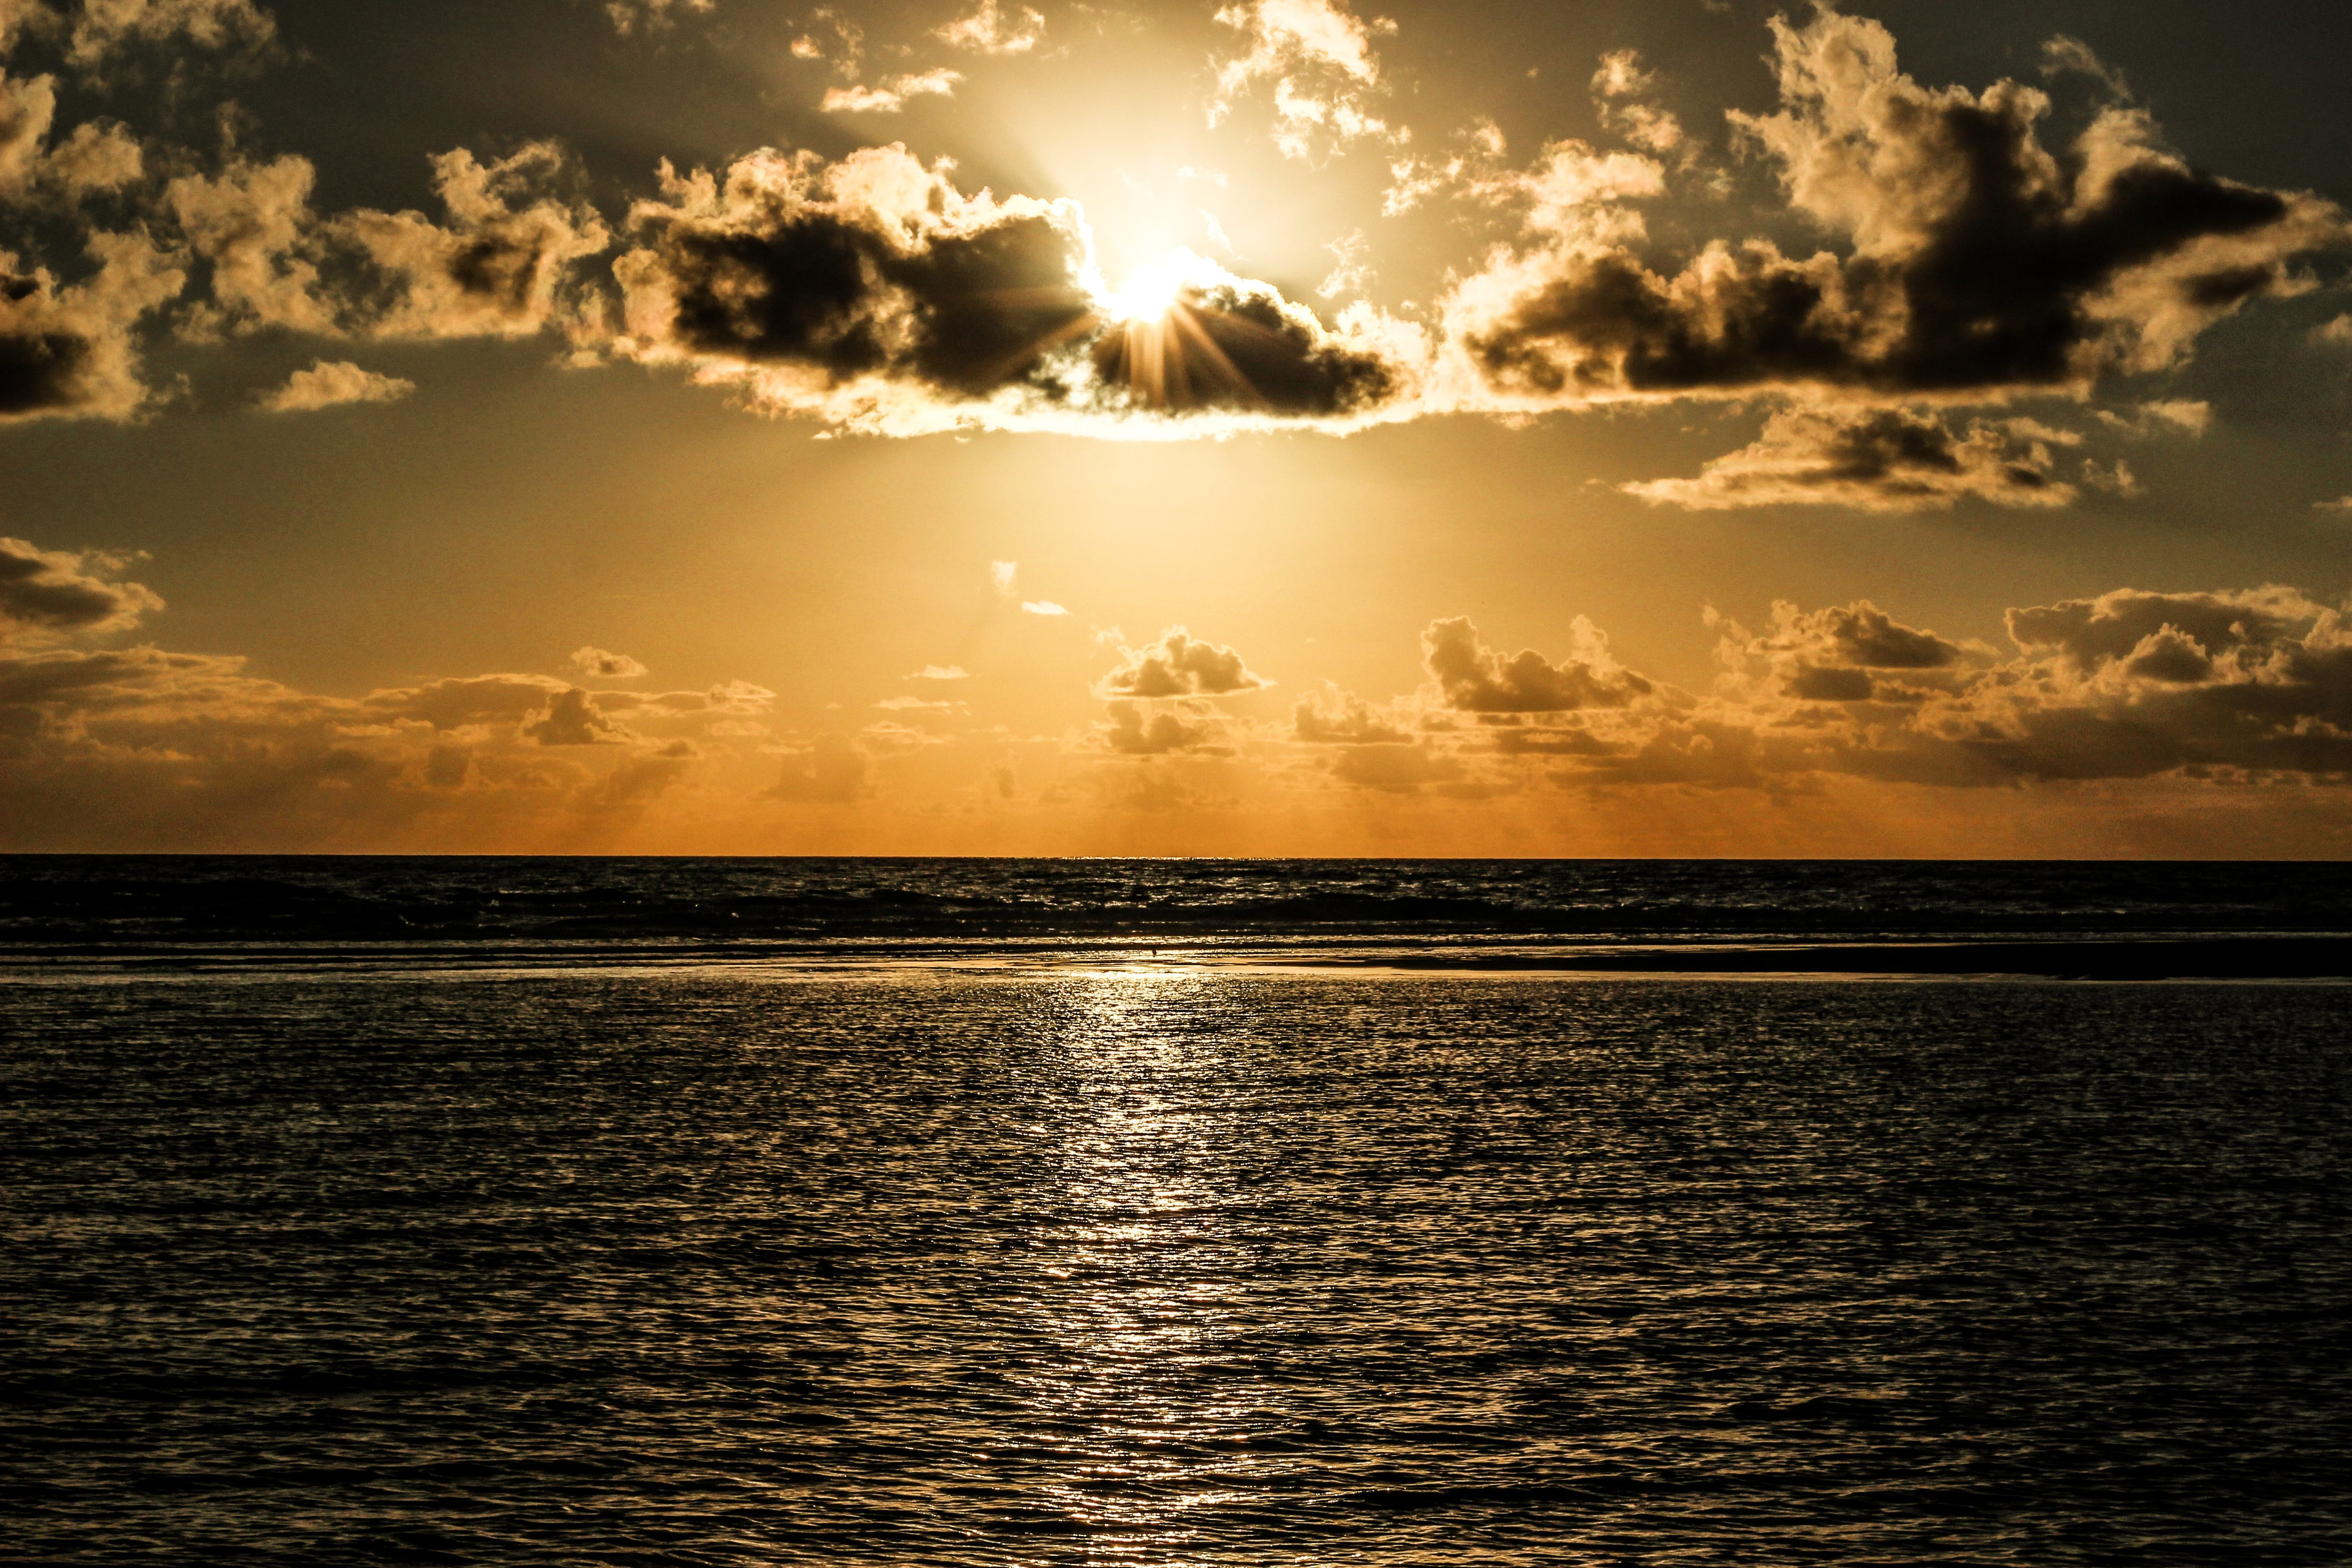 Gratis arkivbilde med daggry, hav, horisont, idyllisk